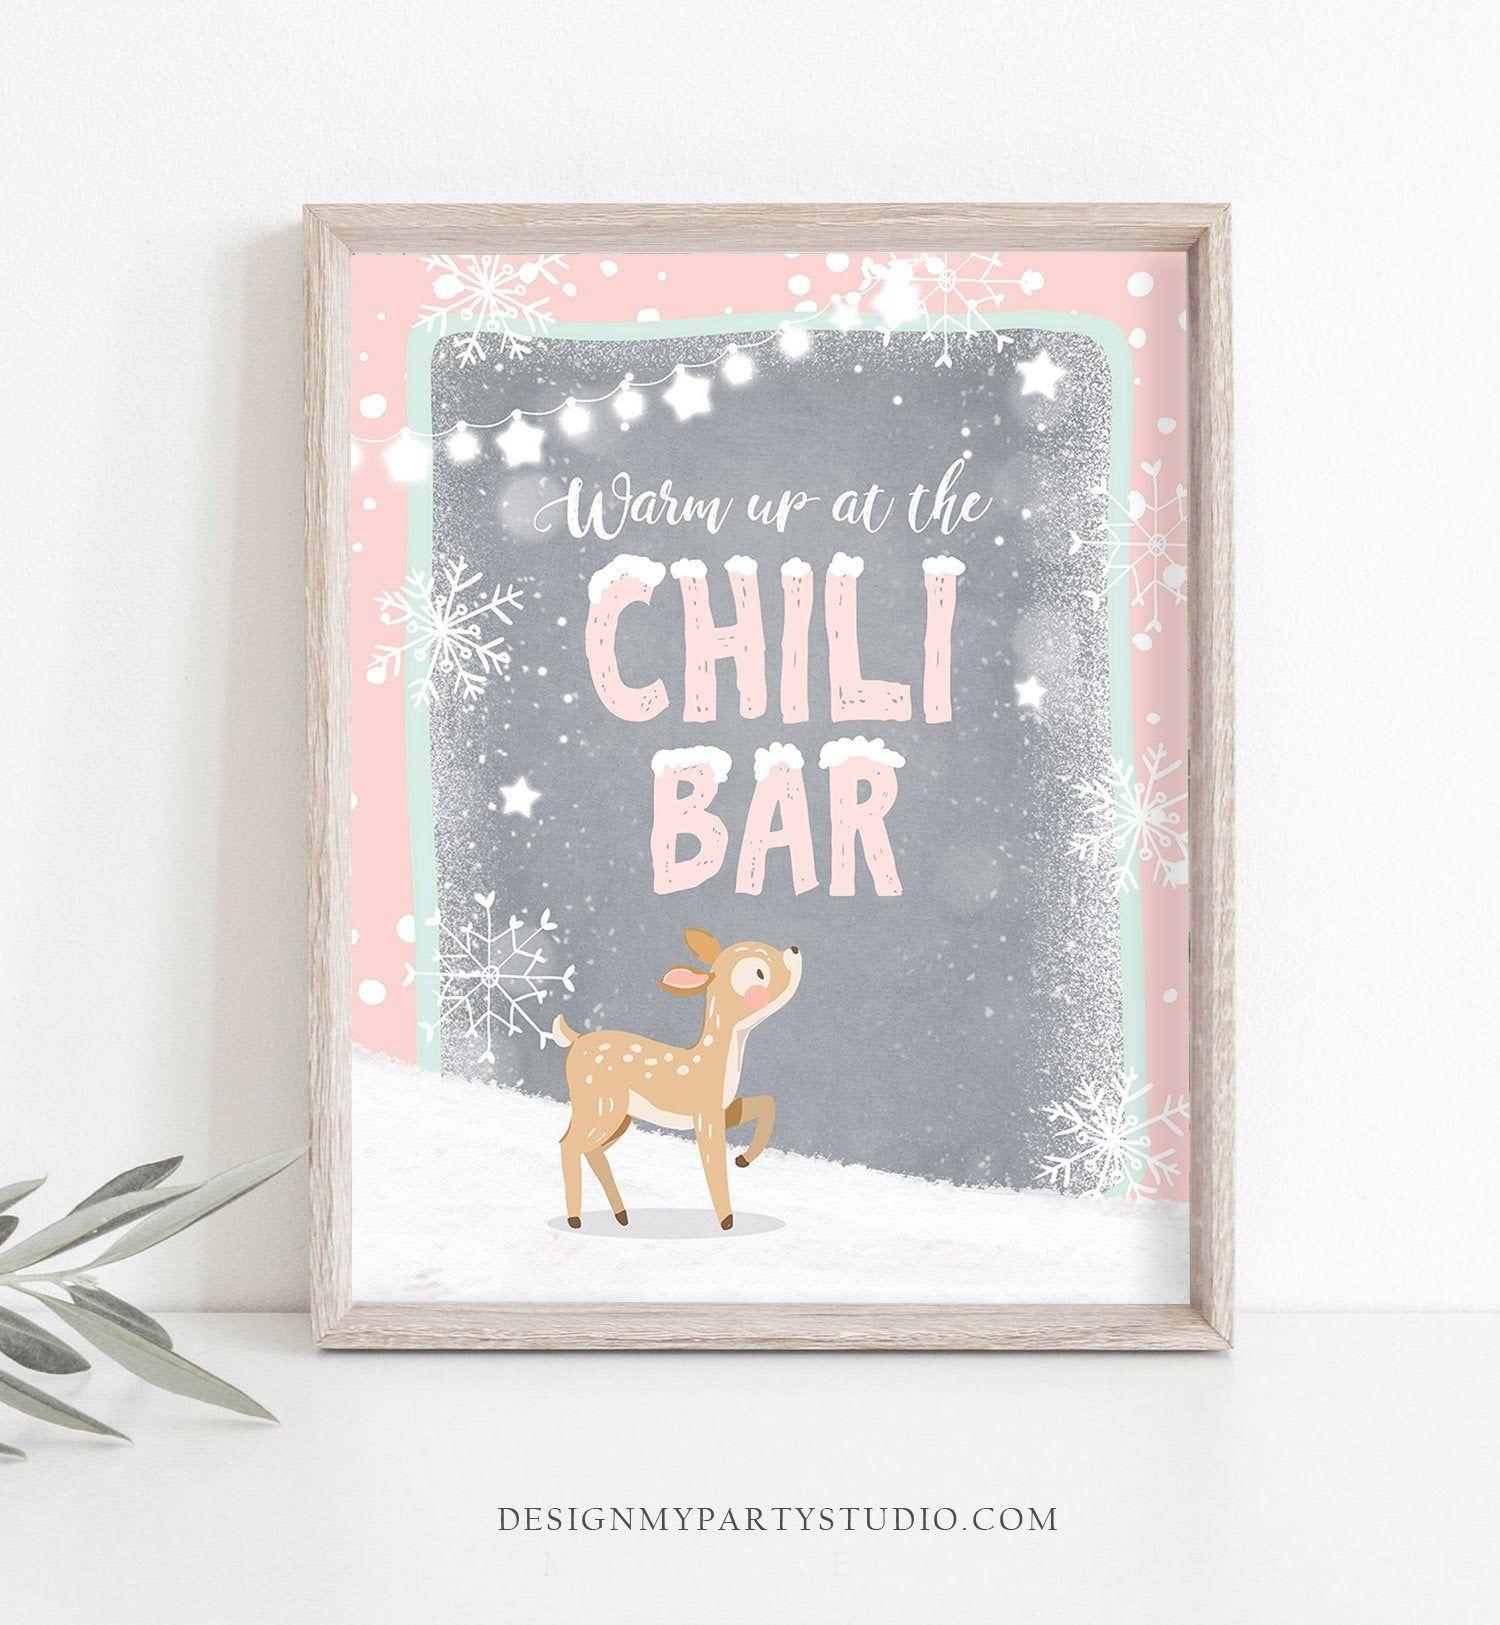 Chili Bar Sign Warm up at the Chili Bar Table Sign Girl Birthday Deer Winter Onederland Decorations Pink Snowflakes Digital PRINTABLE 0109 #chilibar